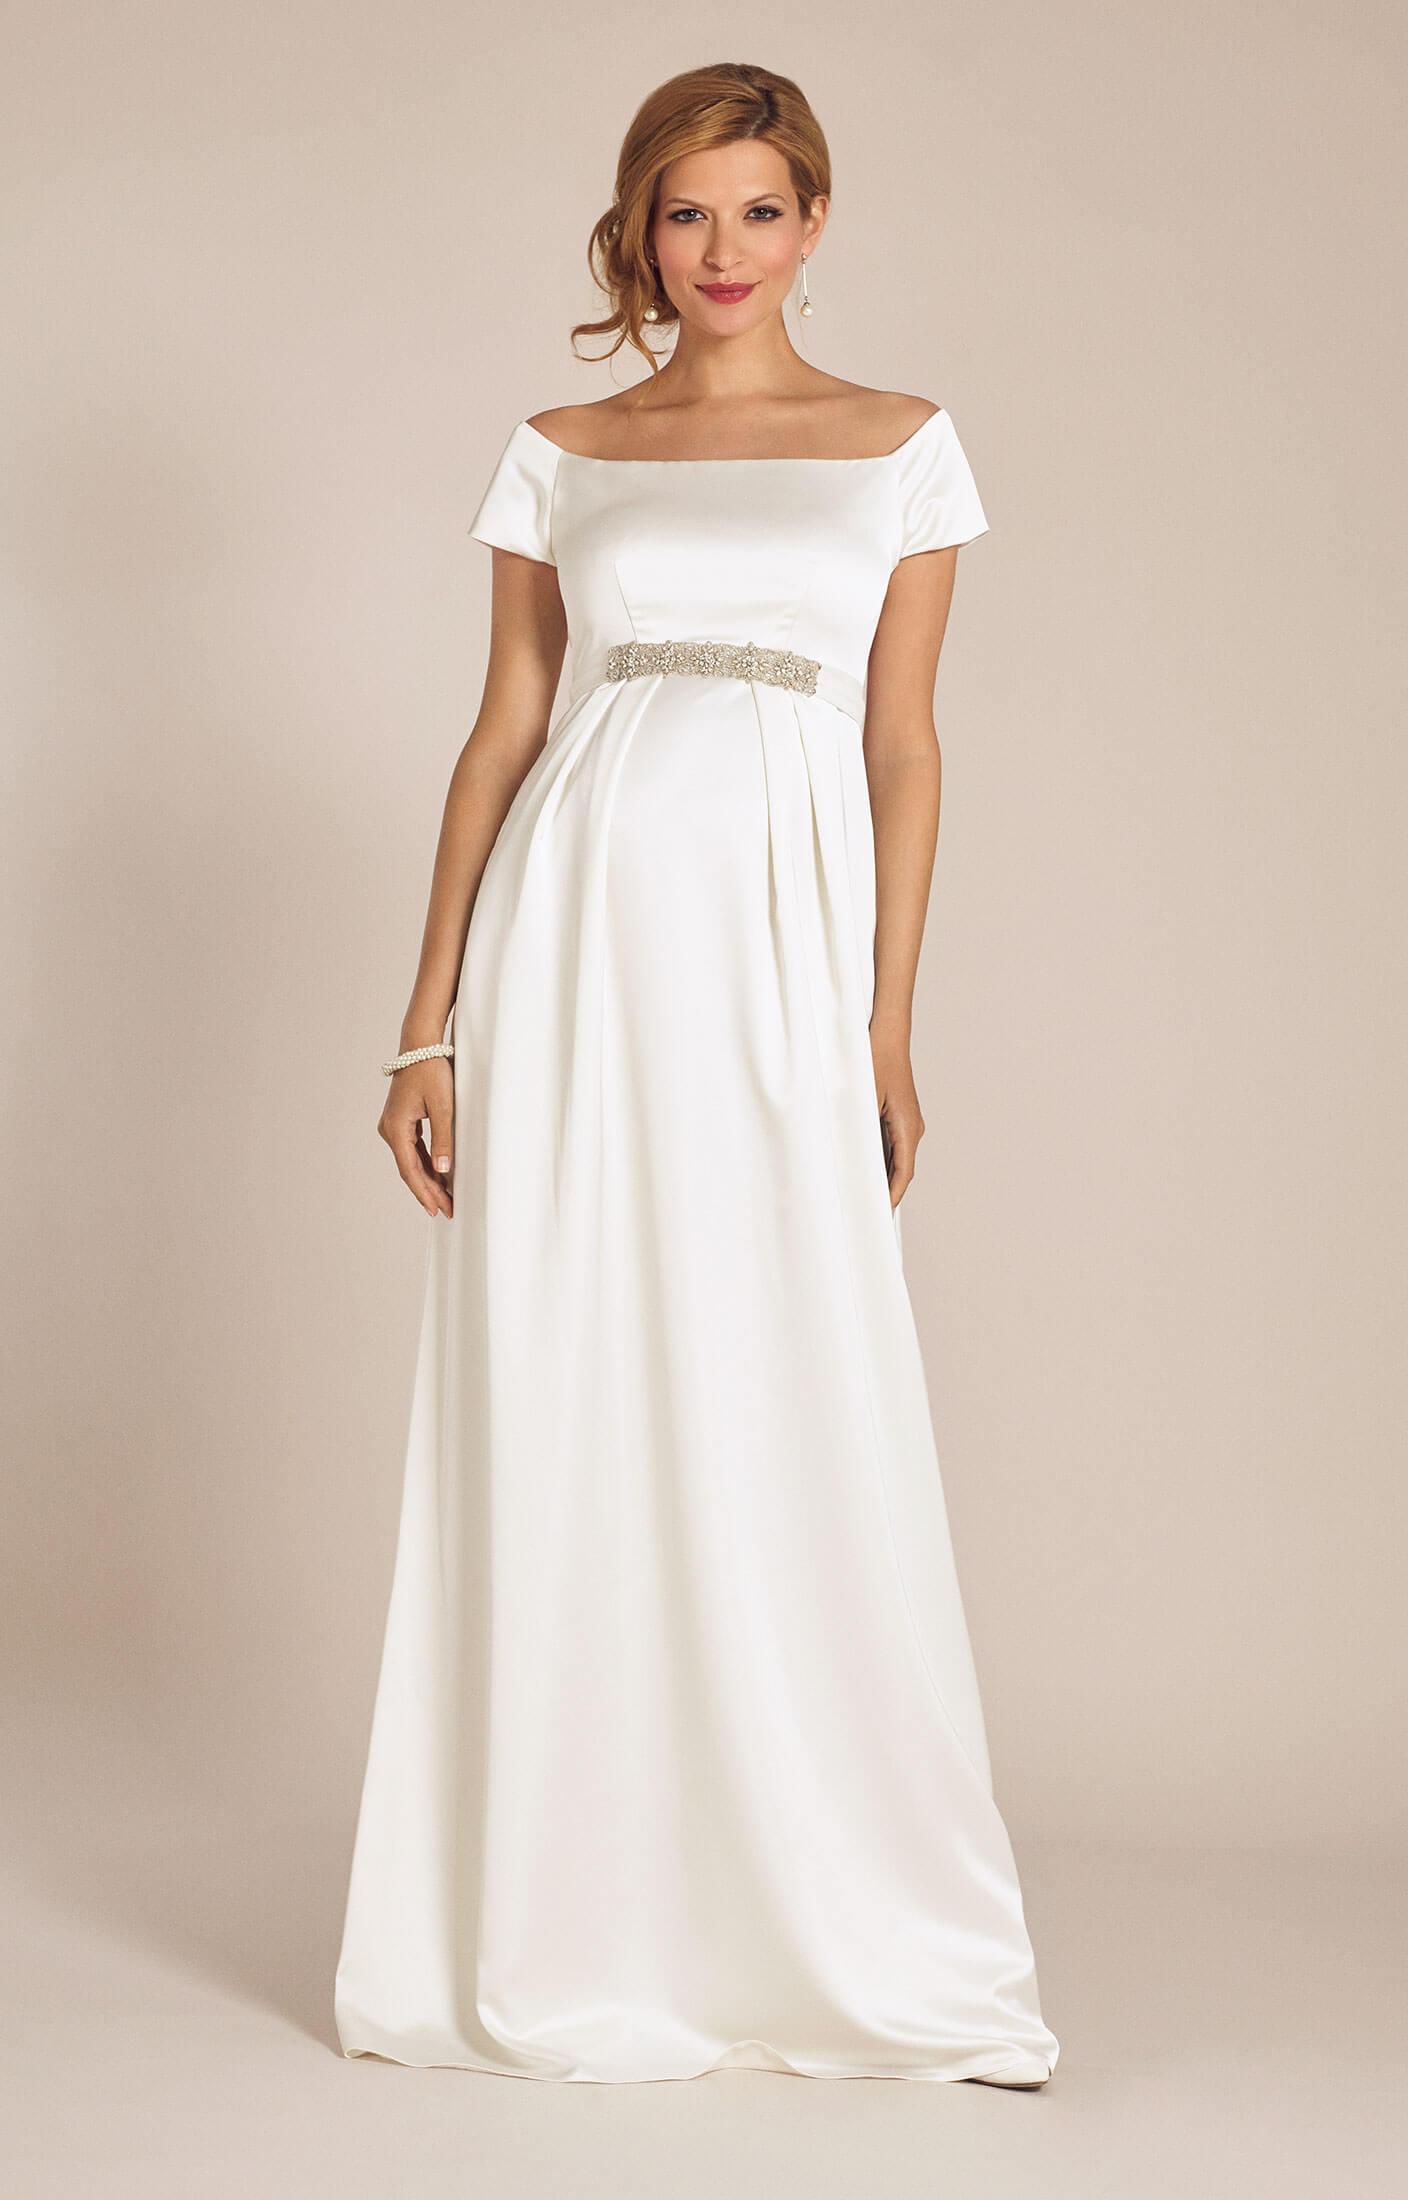 Maternity wedding dresses maternity wedding gowns and maternity aria maternity wedding gown ivory ombrellifo Choice Image